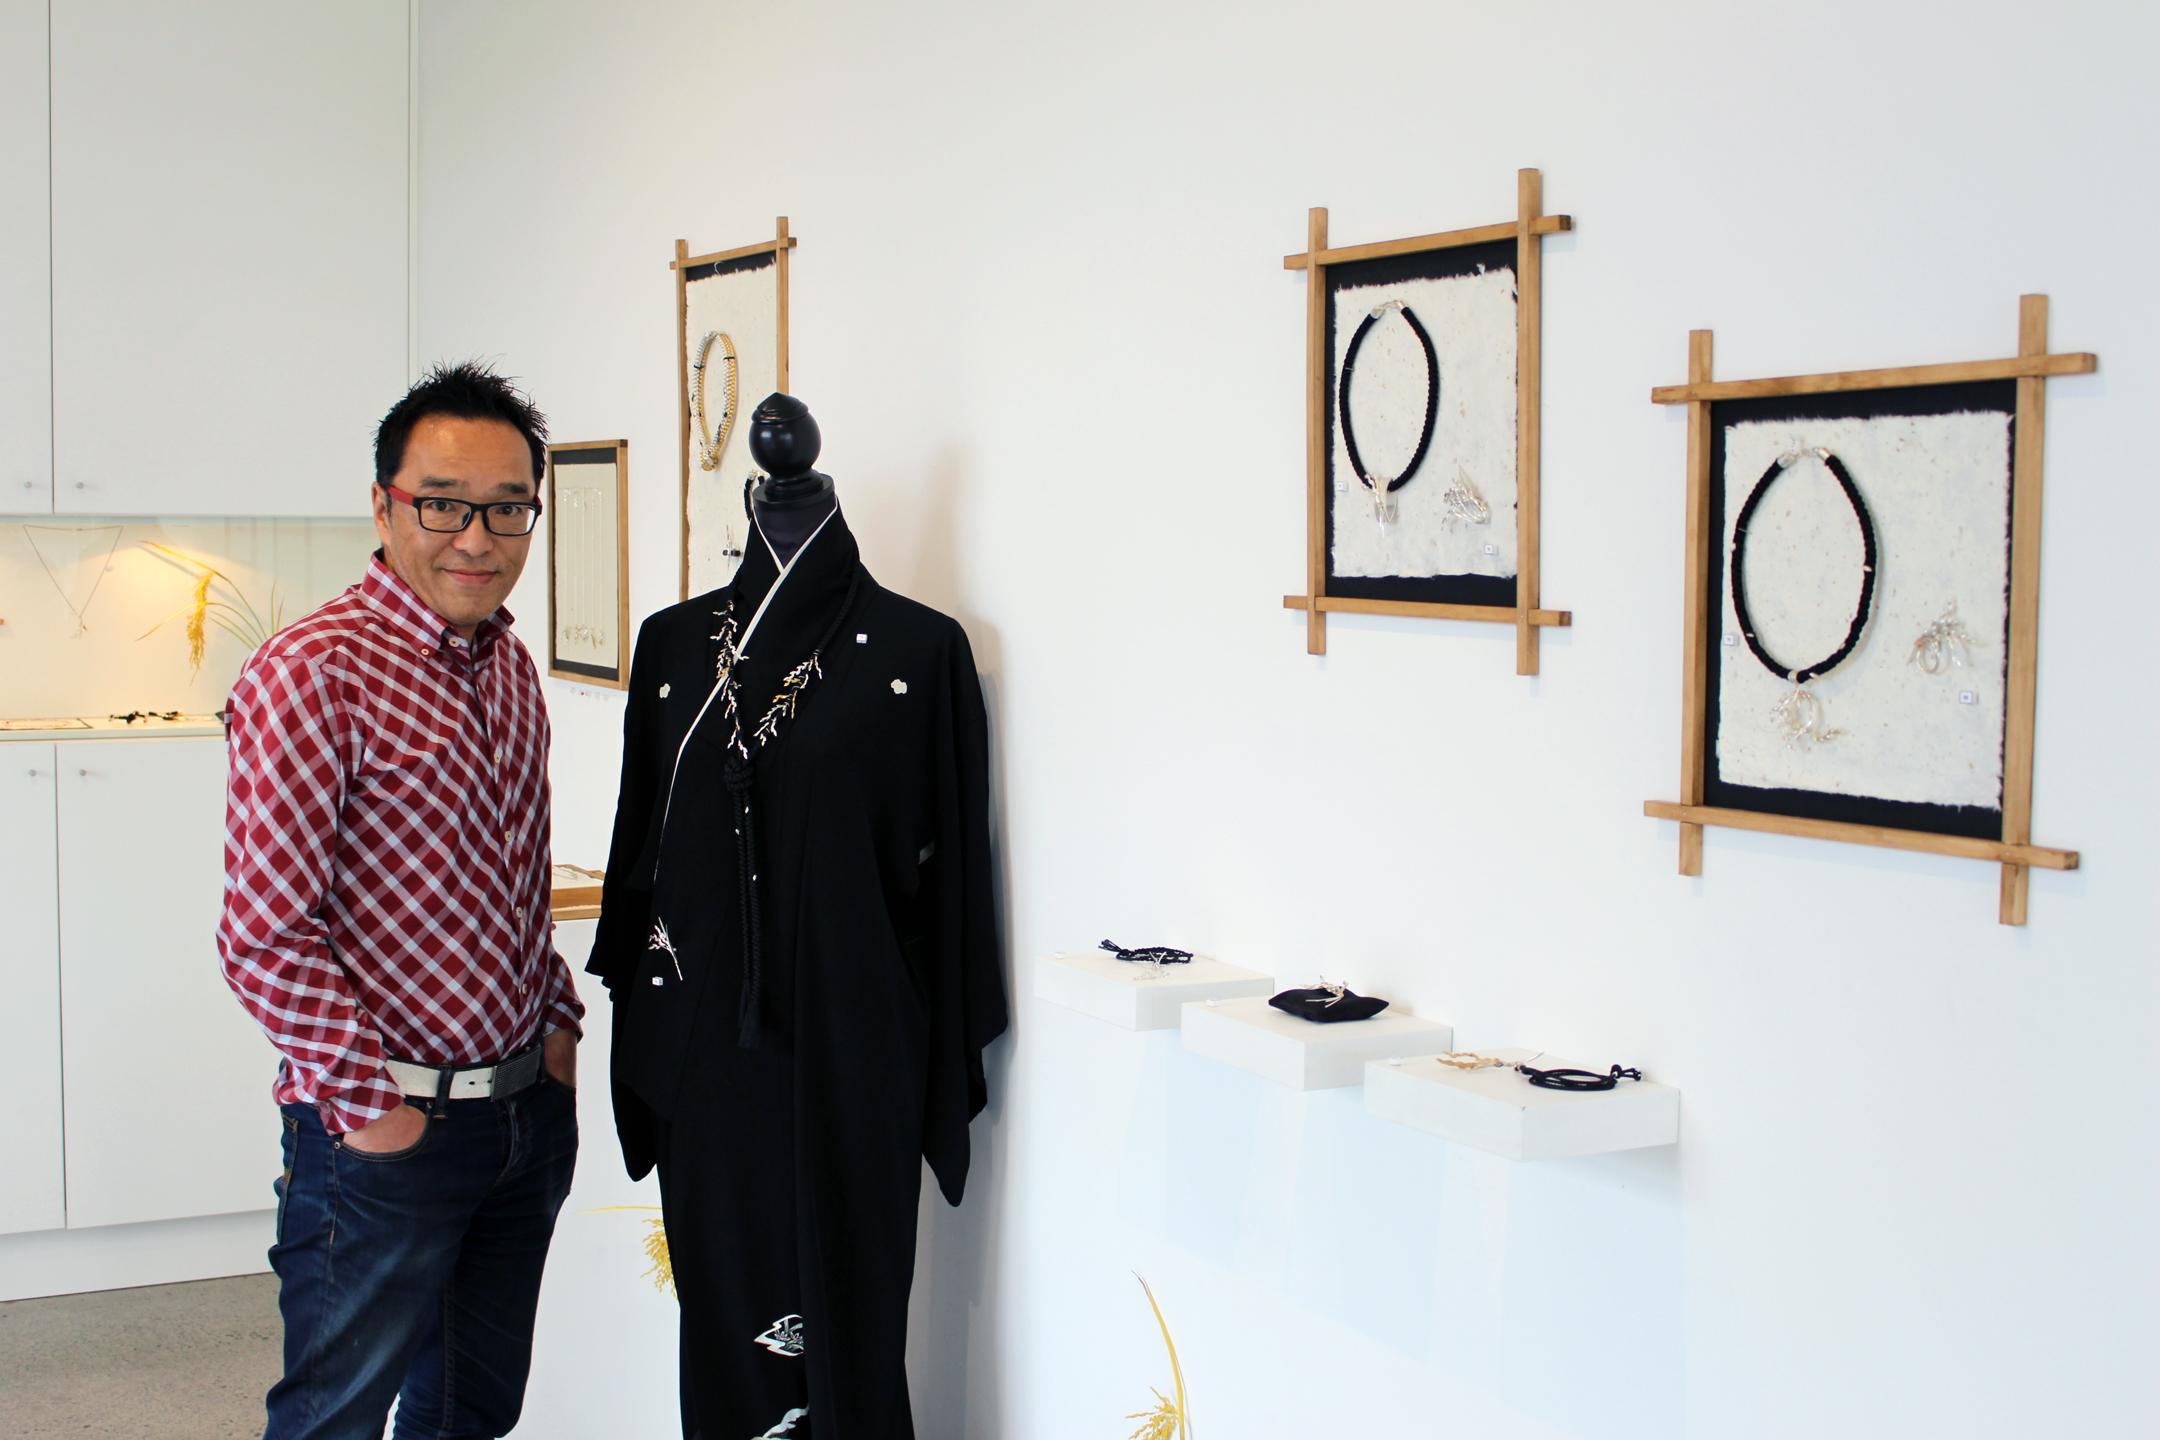 exhibition_opening_6.jpg